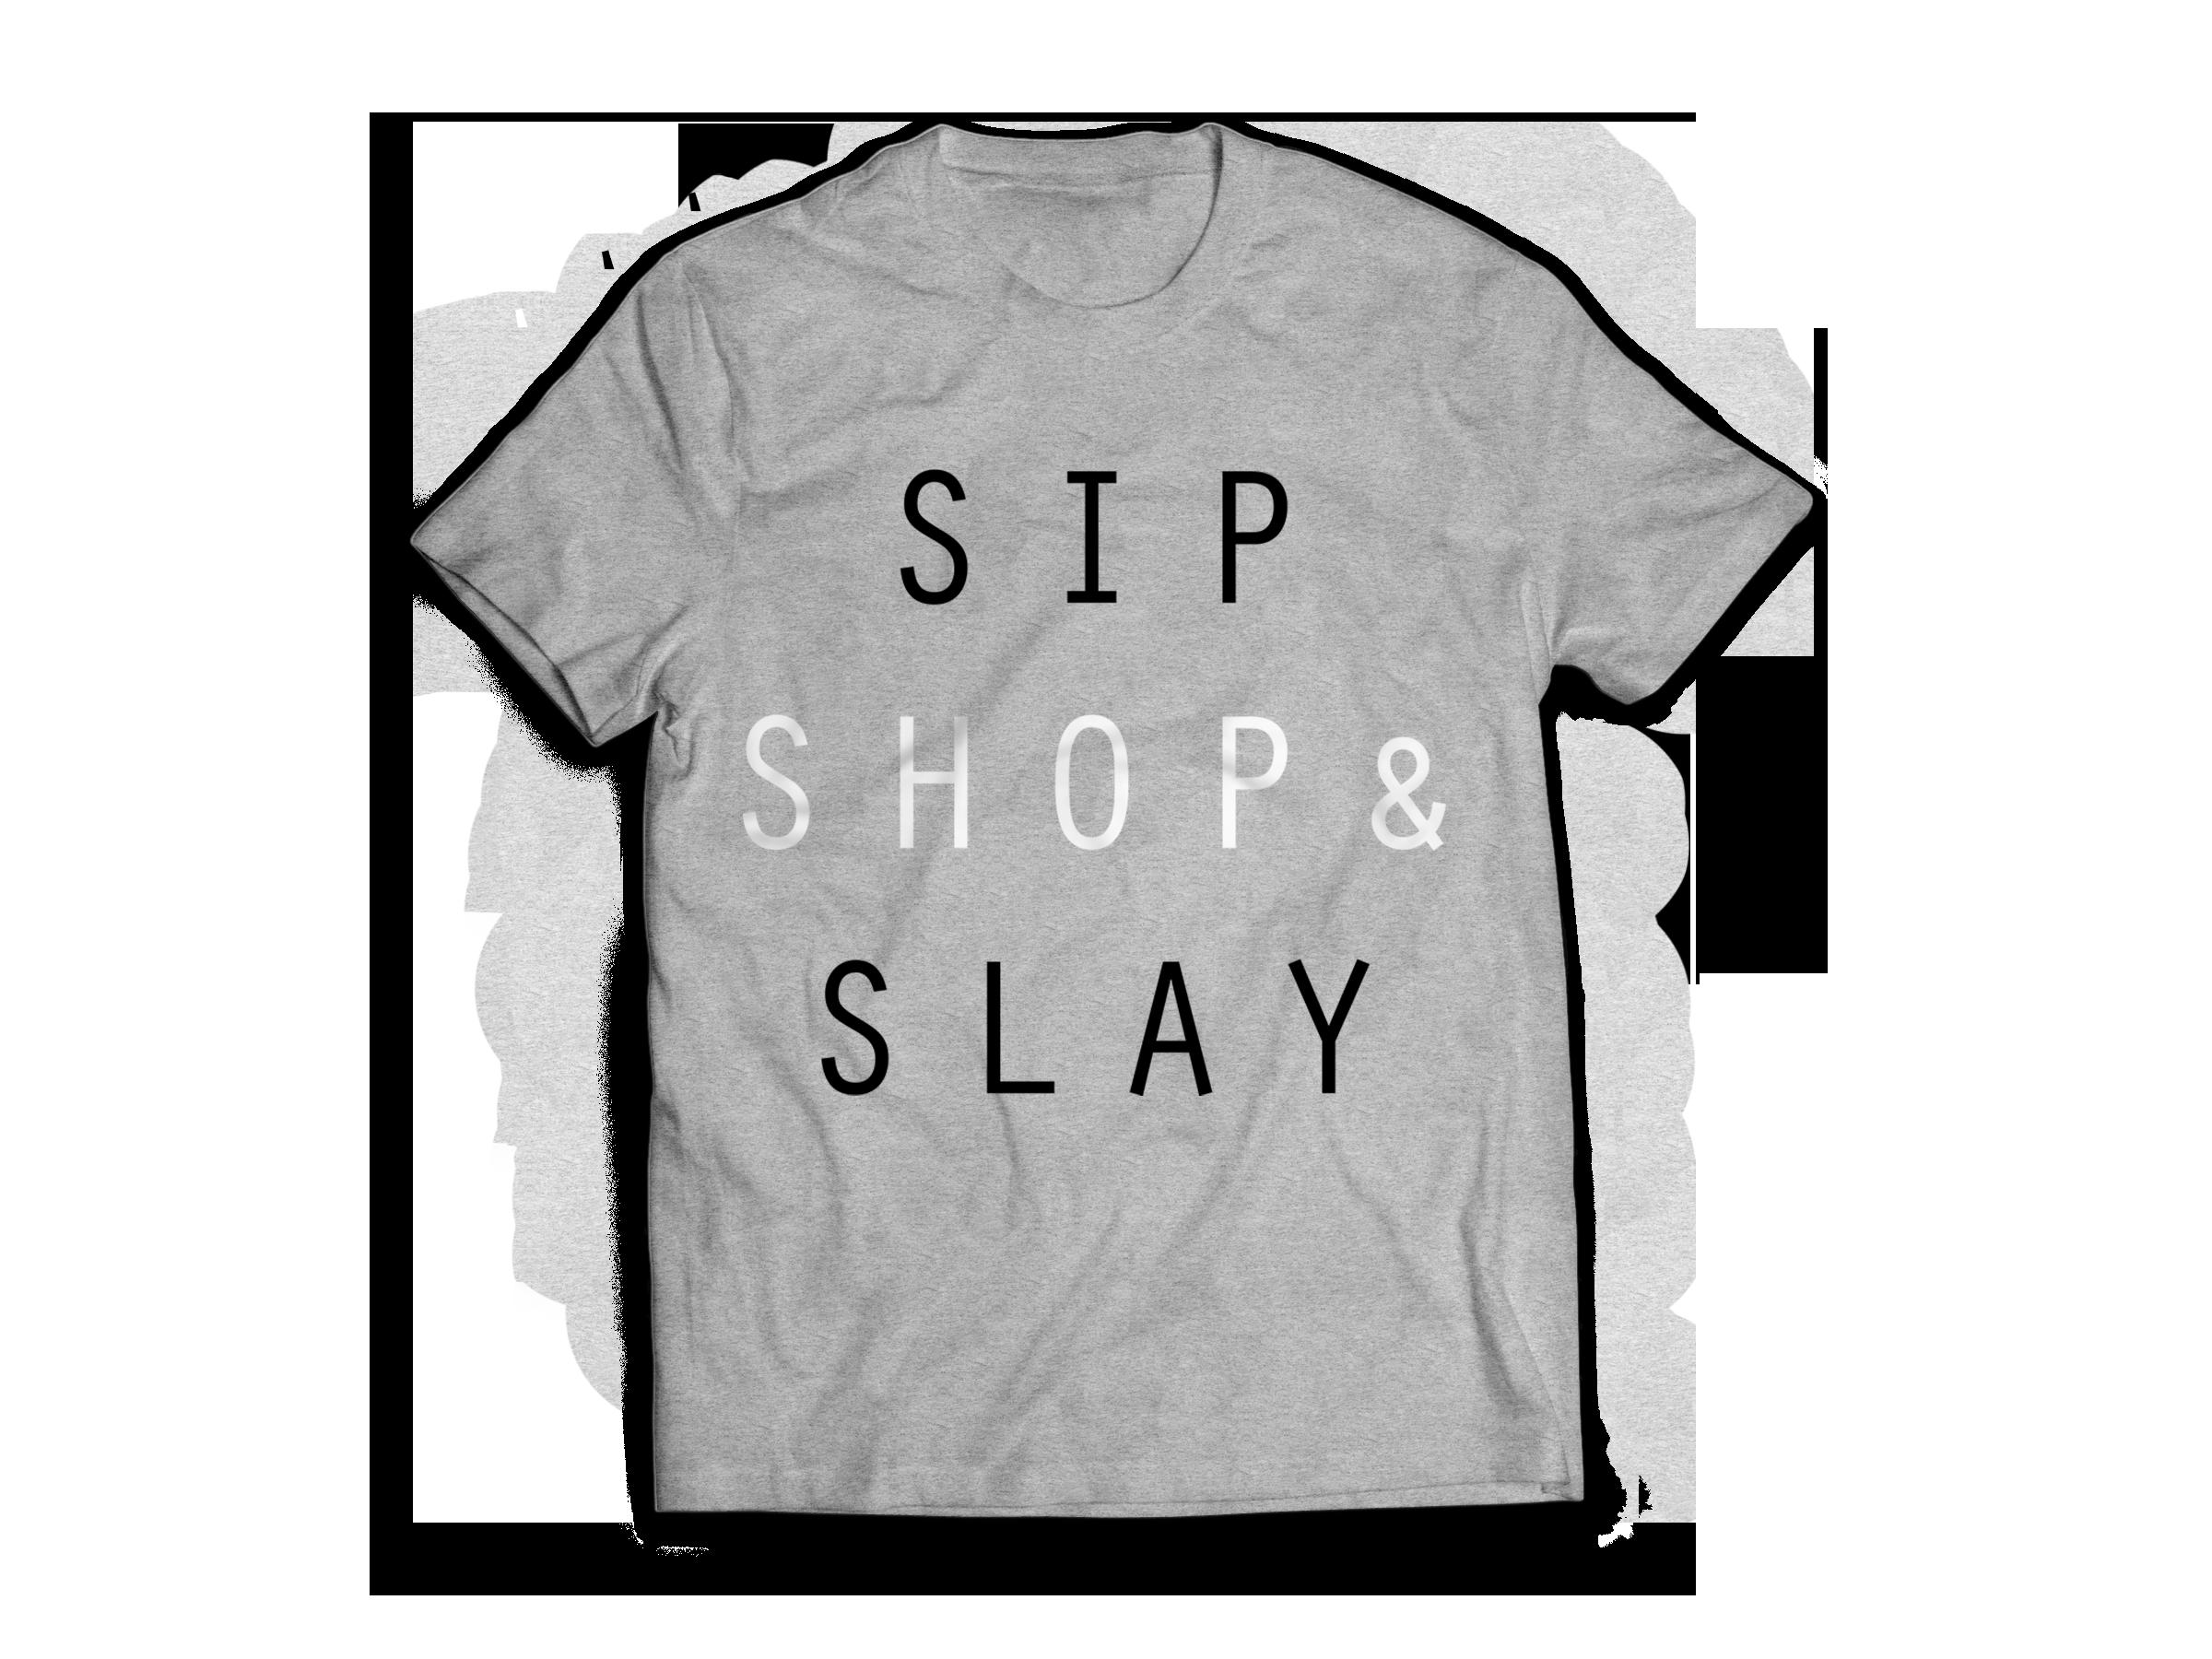 Sip Shop Slay Womens Designer Graphic T Shirt